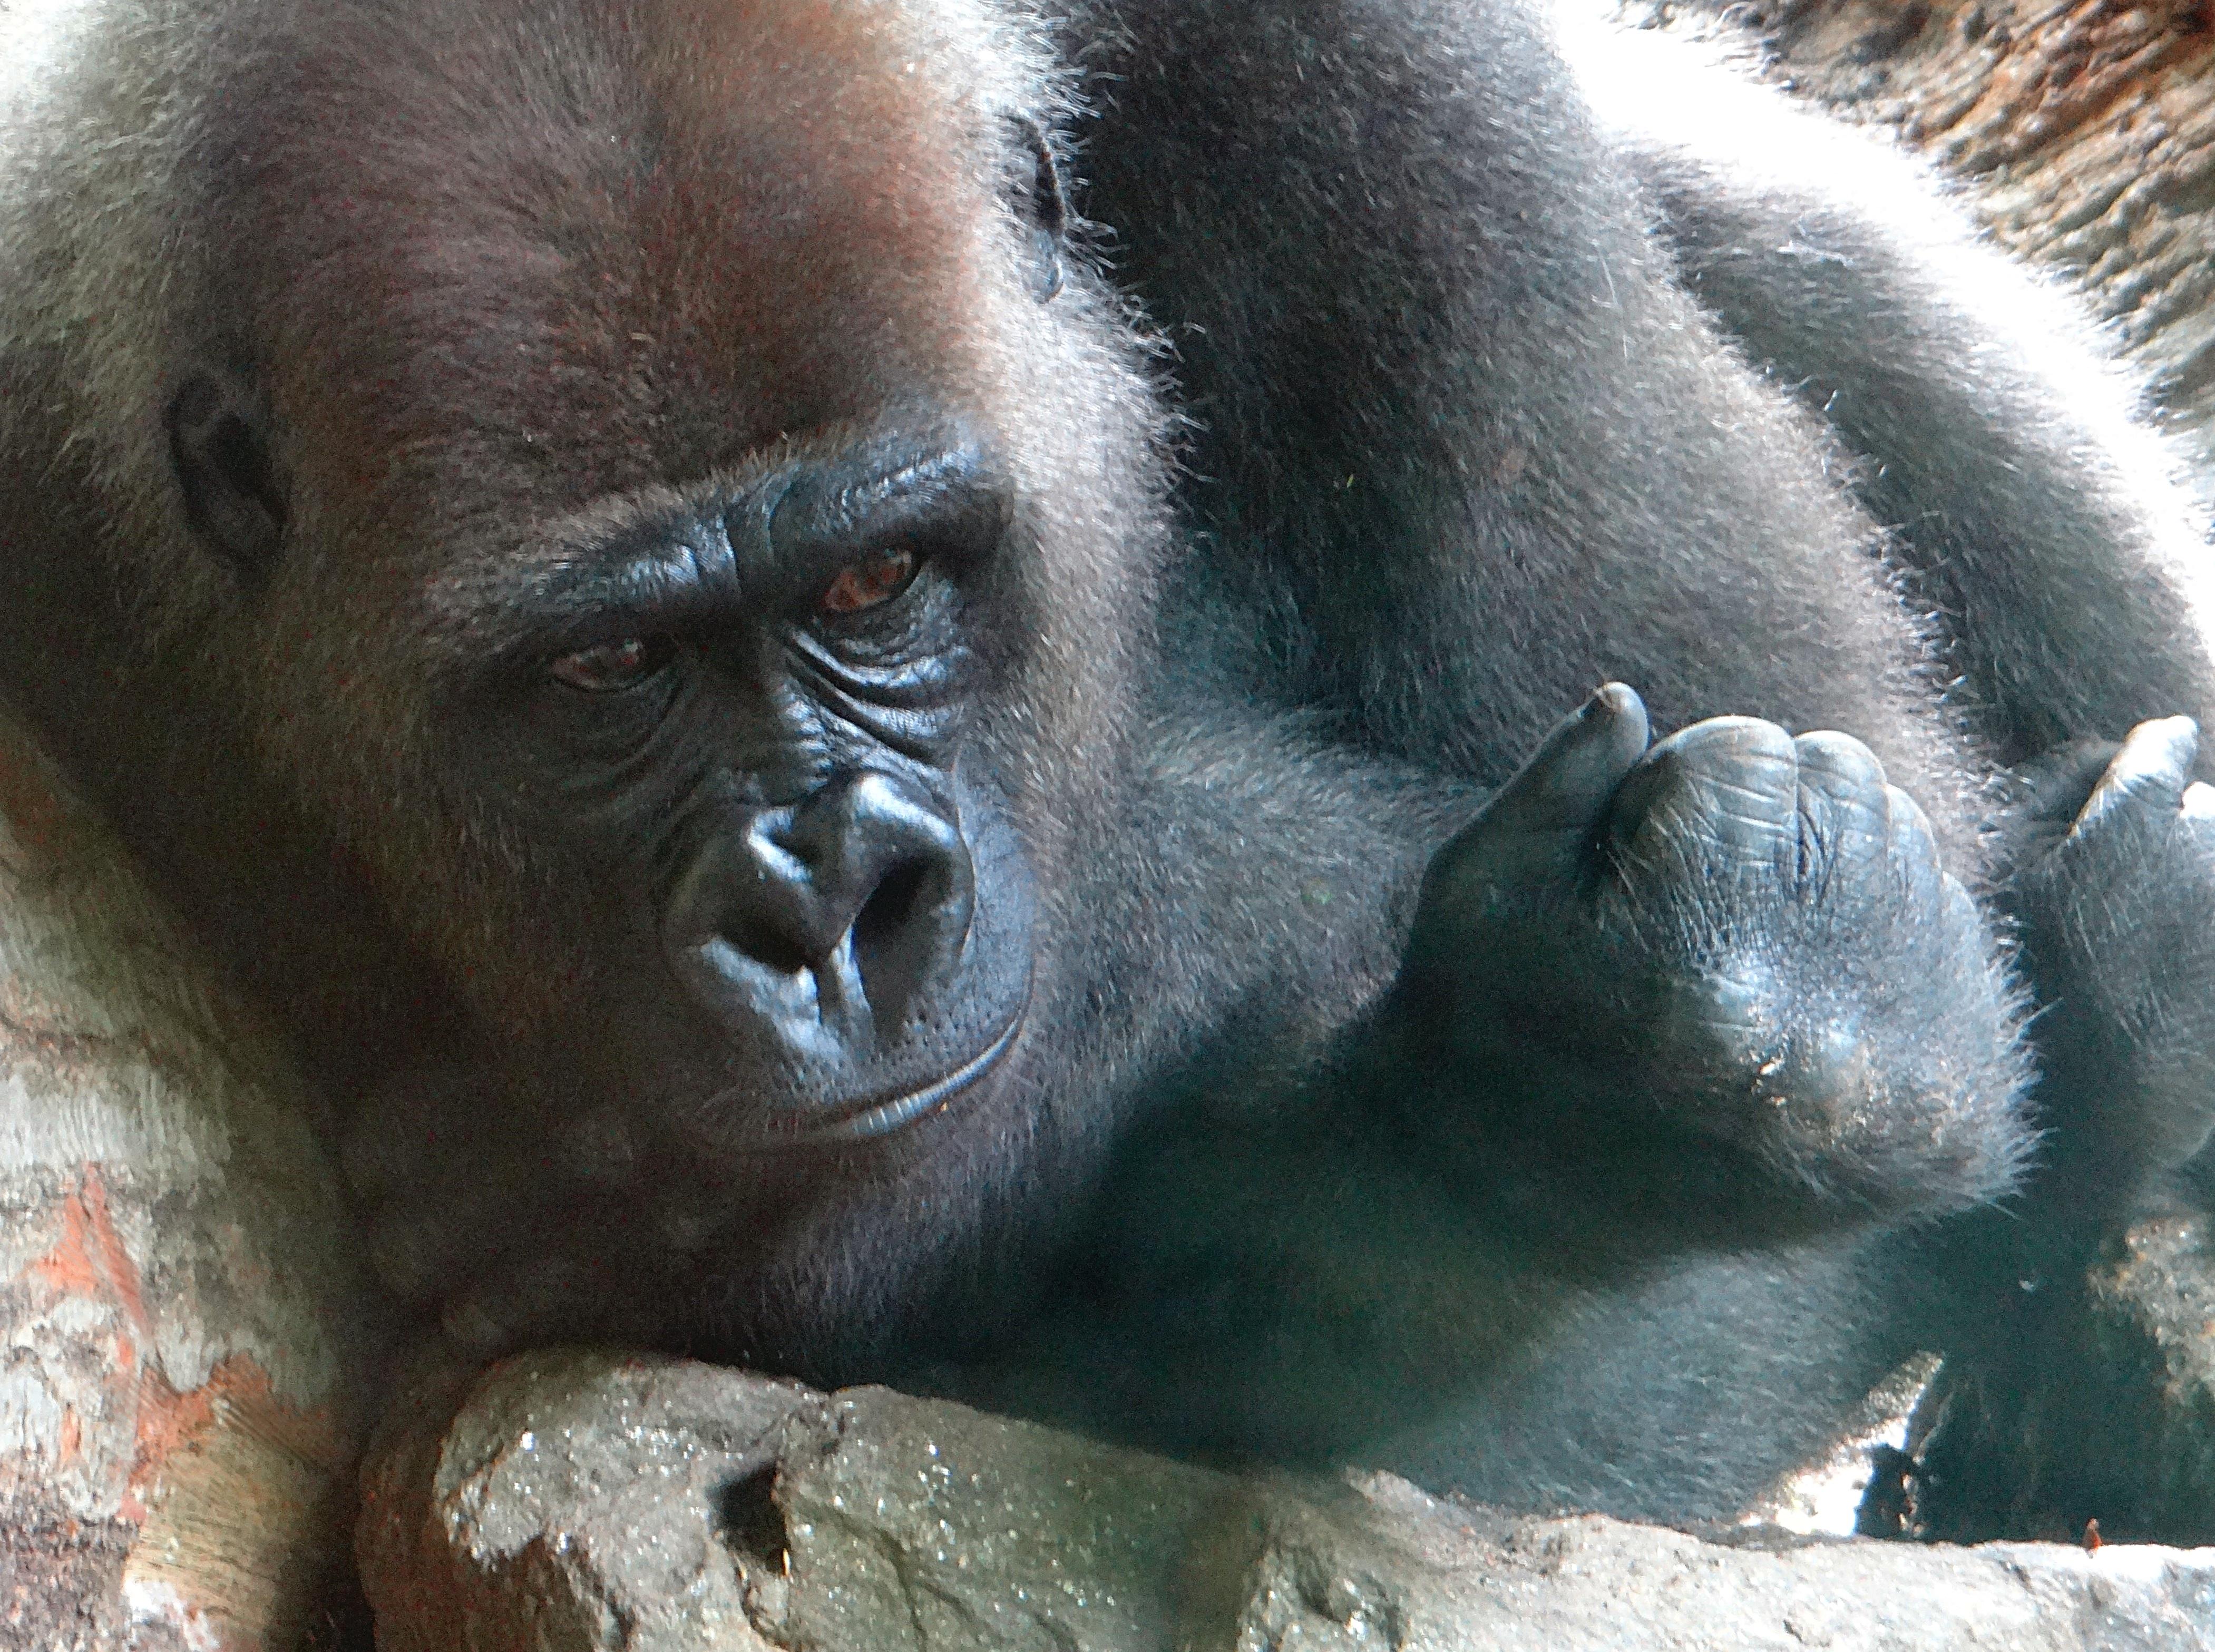 Gorilla at the Bronx Zoo